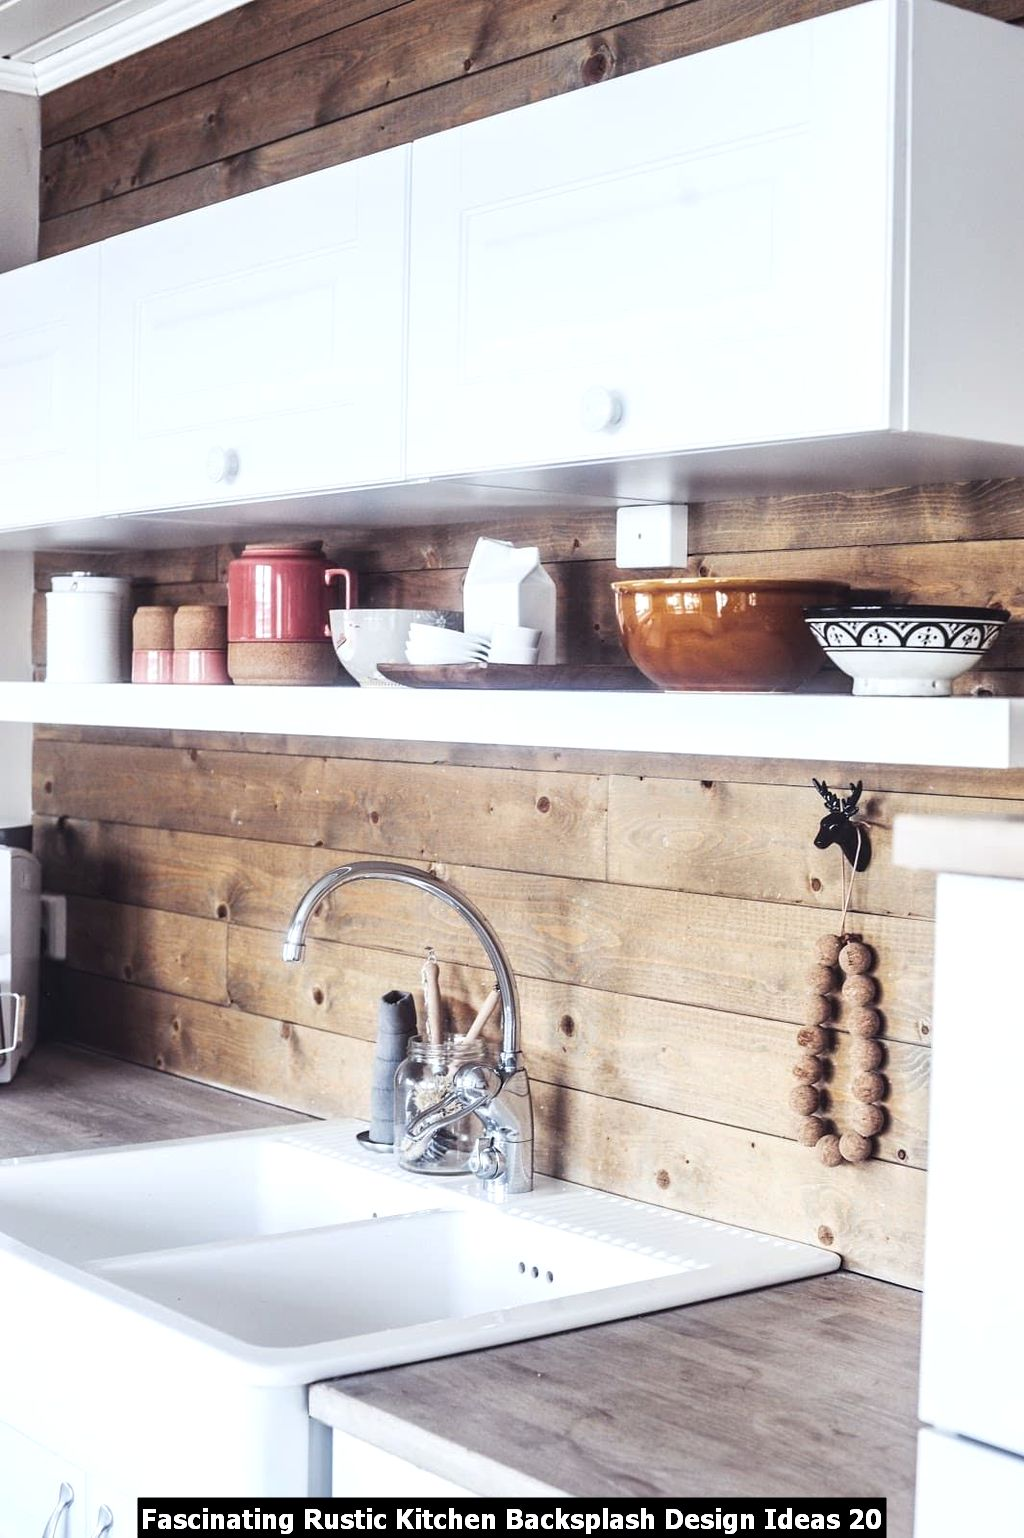 Fascinating Rustic Kitchen Backsplash Design Ideas 20